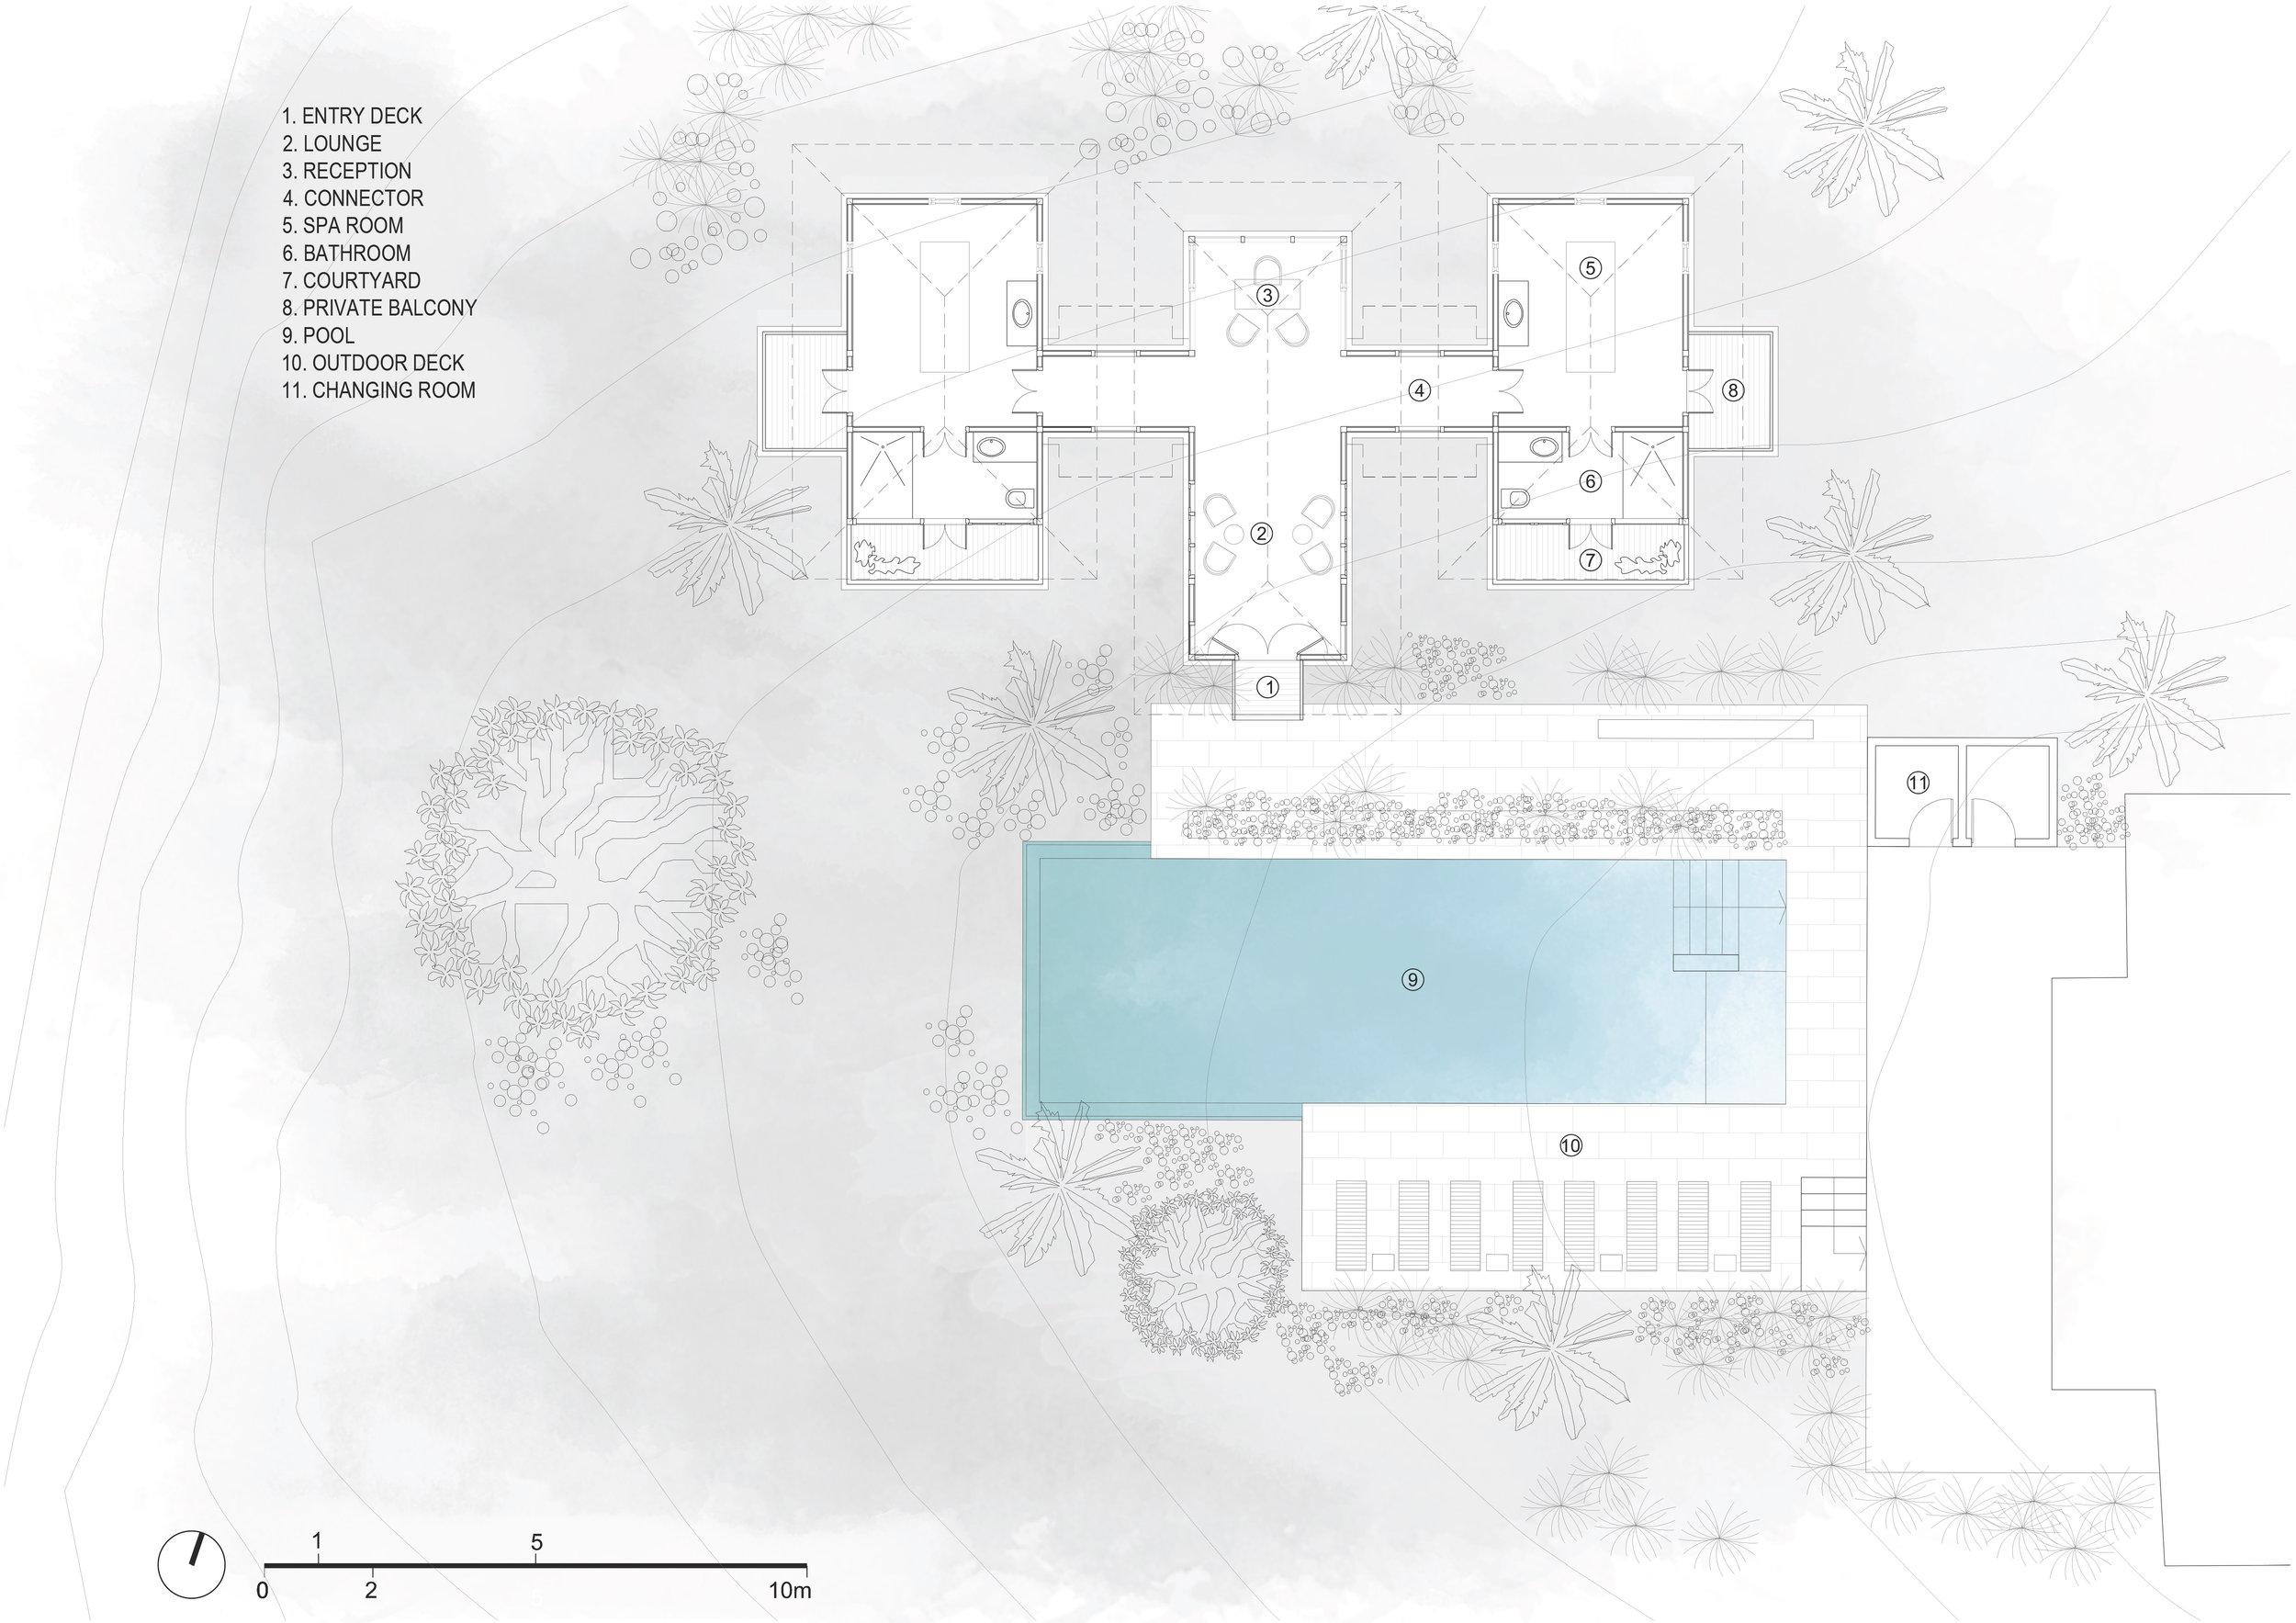 050218_NRCC_Design Spa^Pool-Plan.jpg